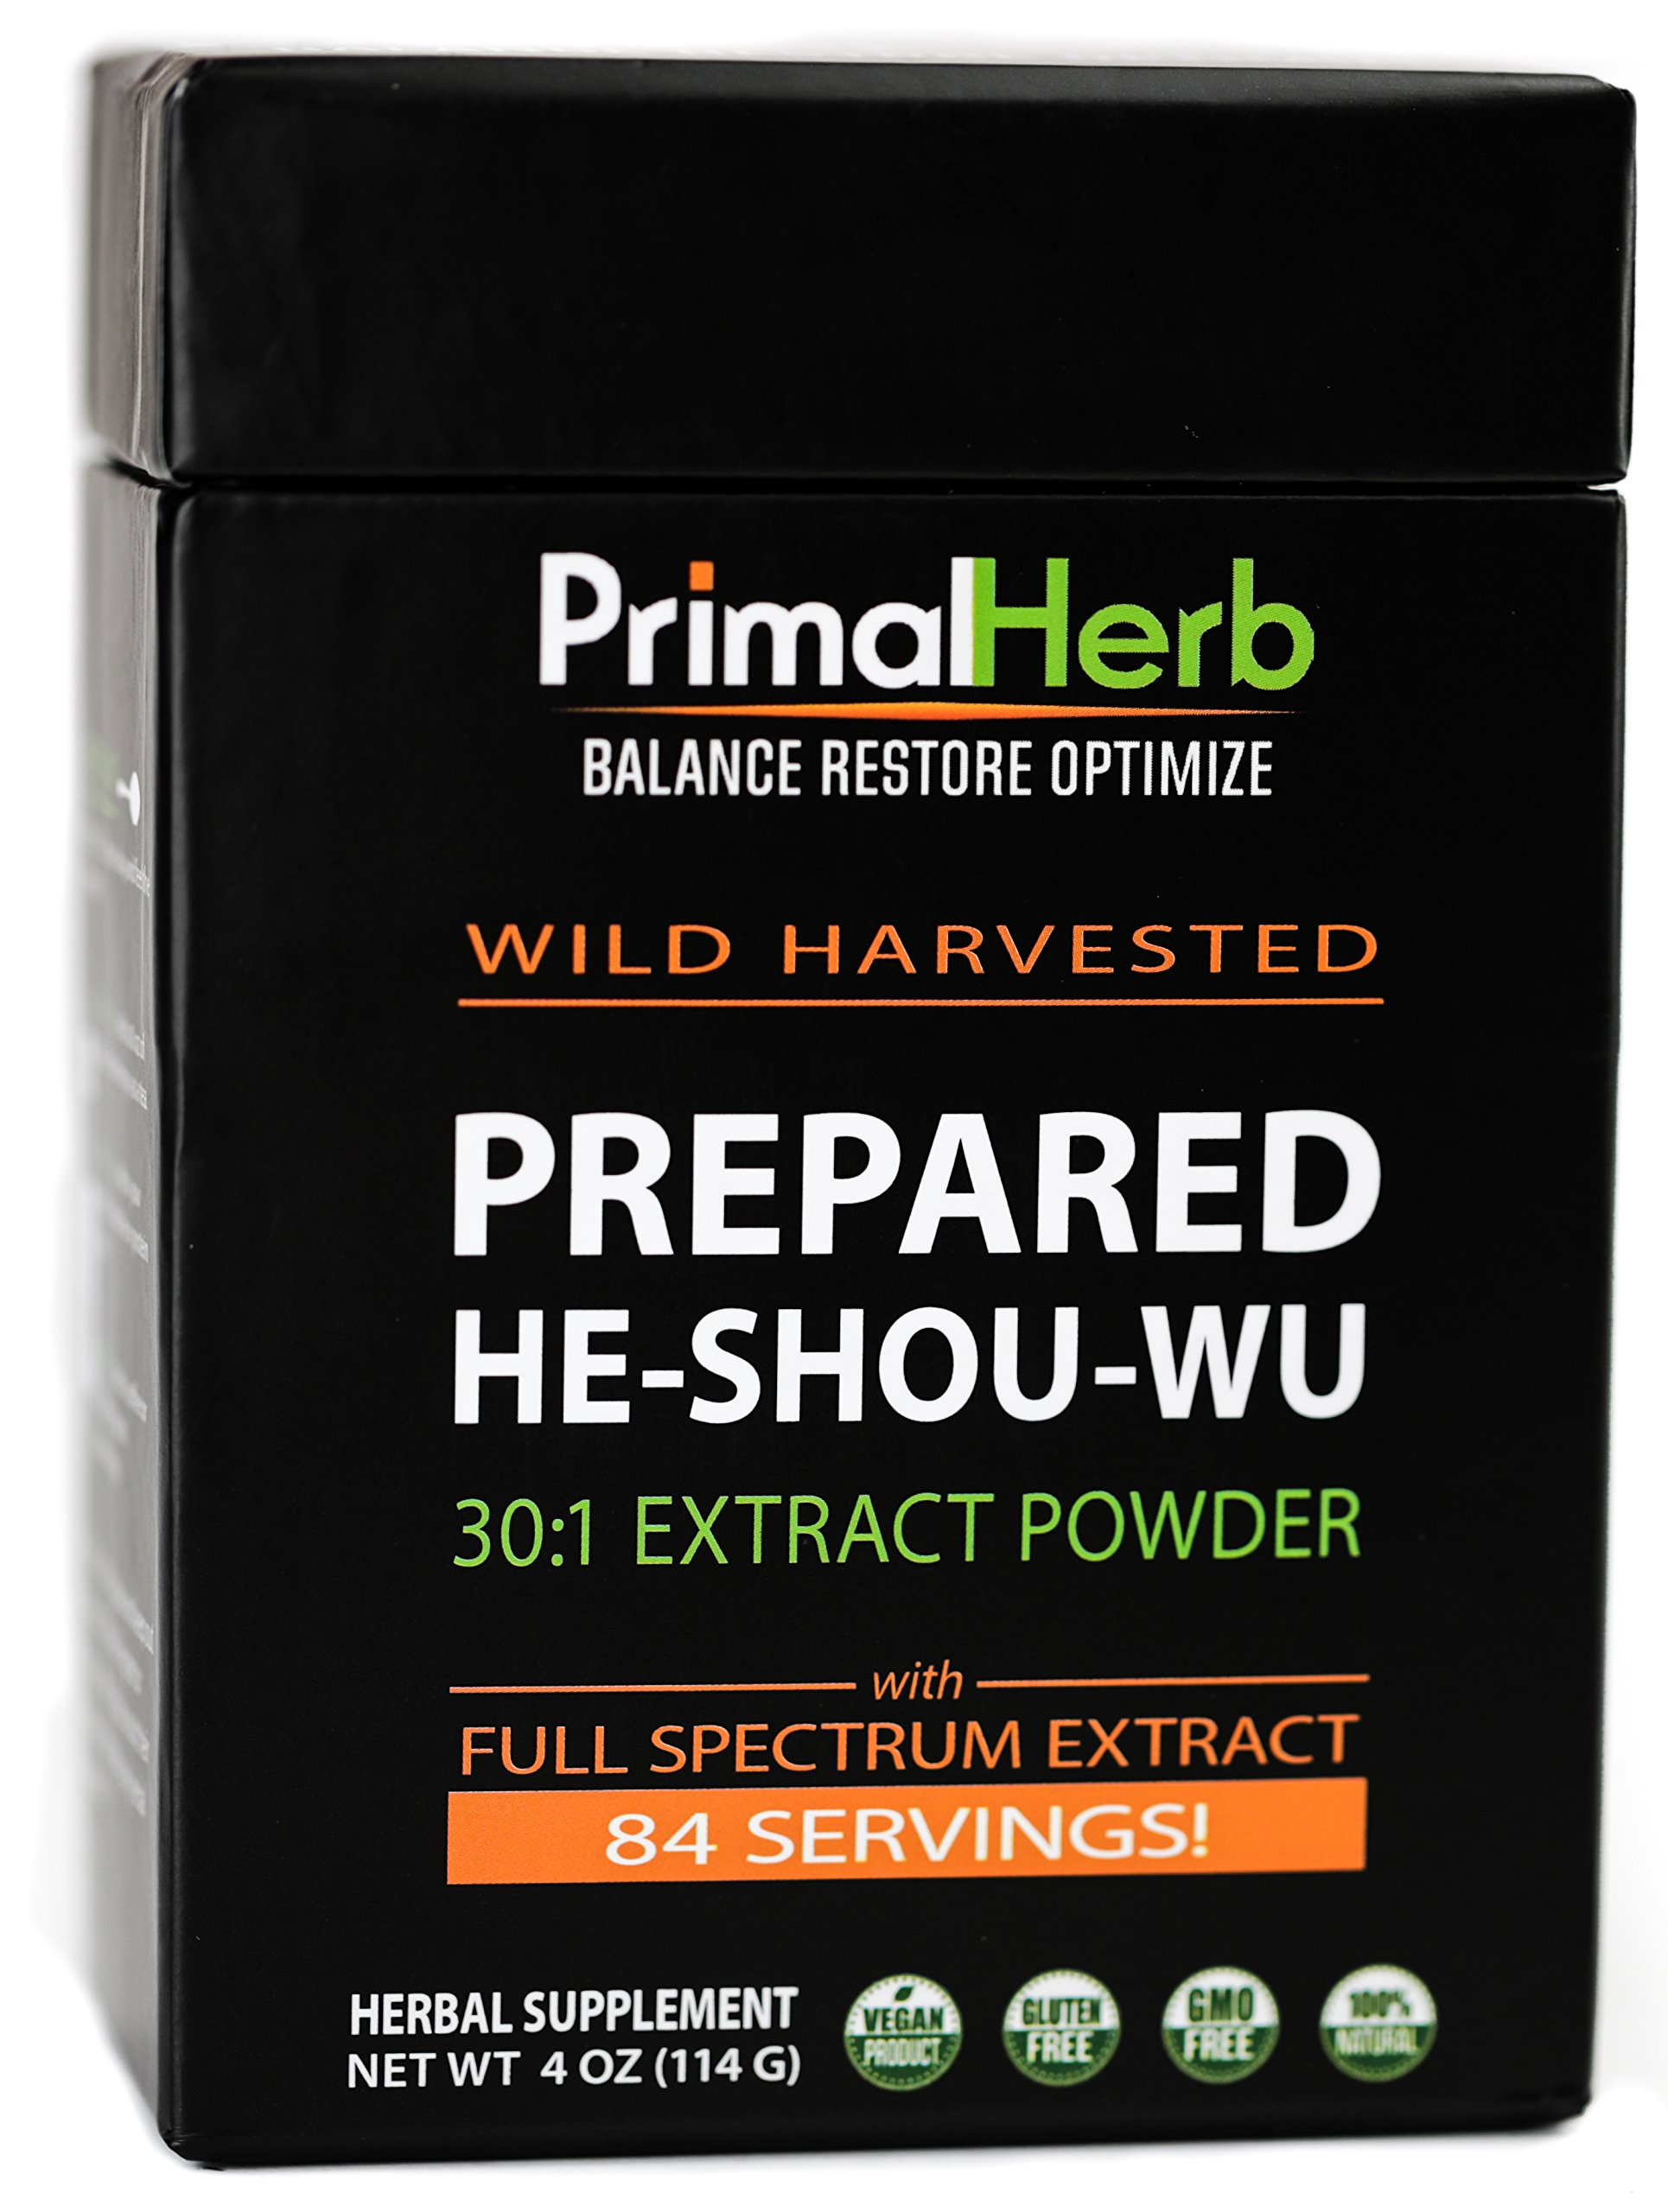 He Shou Wu Fo ti Root Extract Powder - by Primal Herb   Longevity Tea - 9e8a3772e7eb